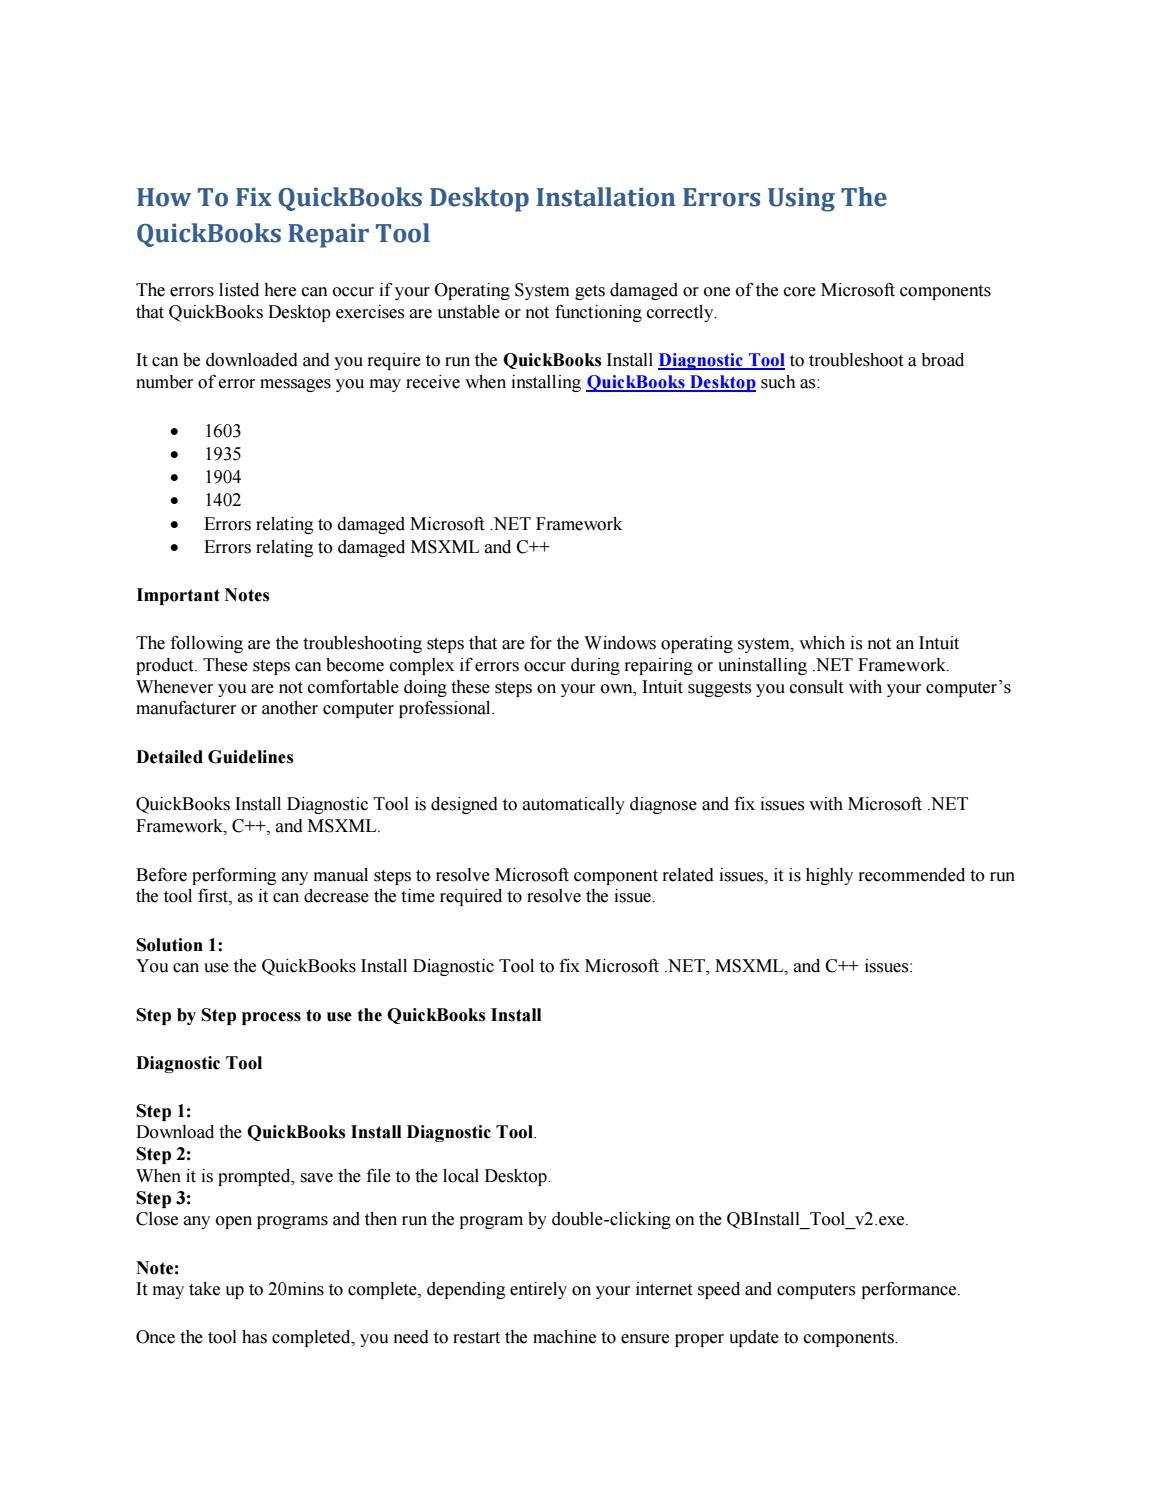 How to fix quickbooks desktop installation errors using the